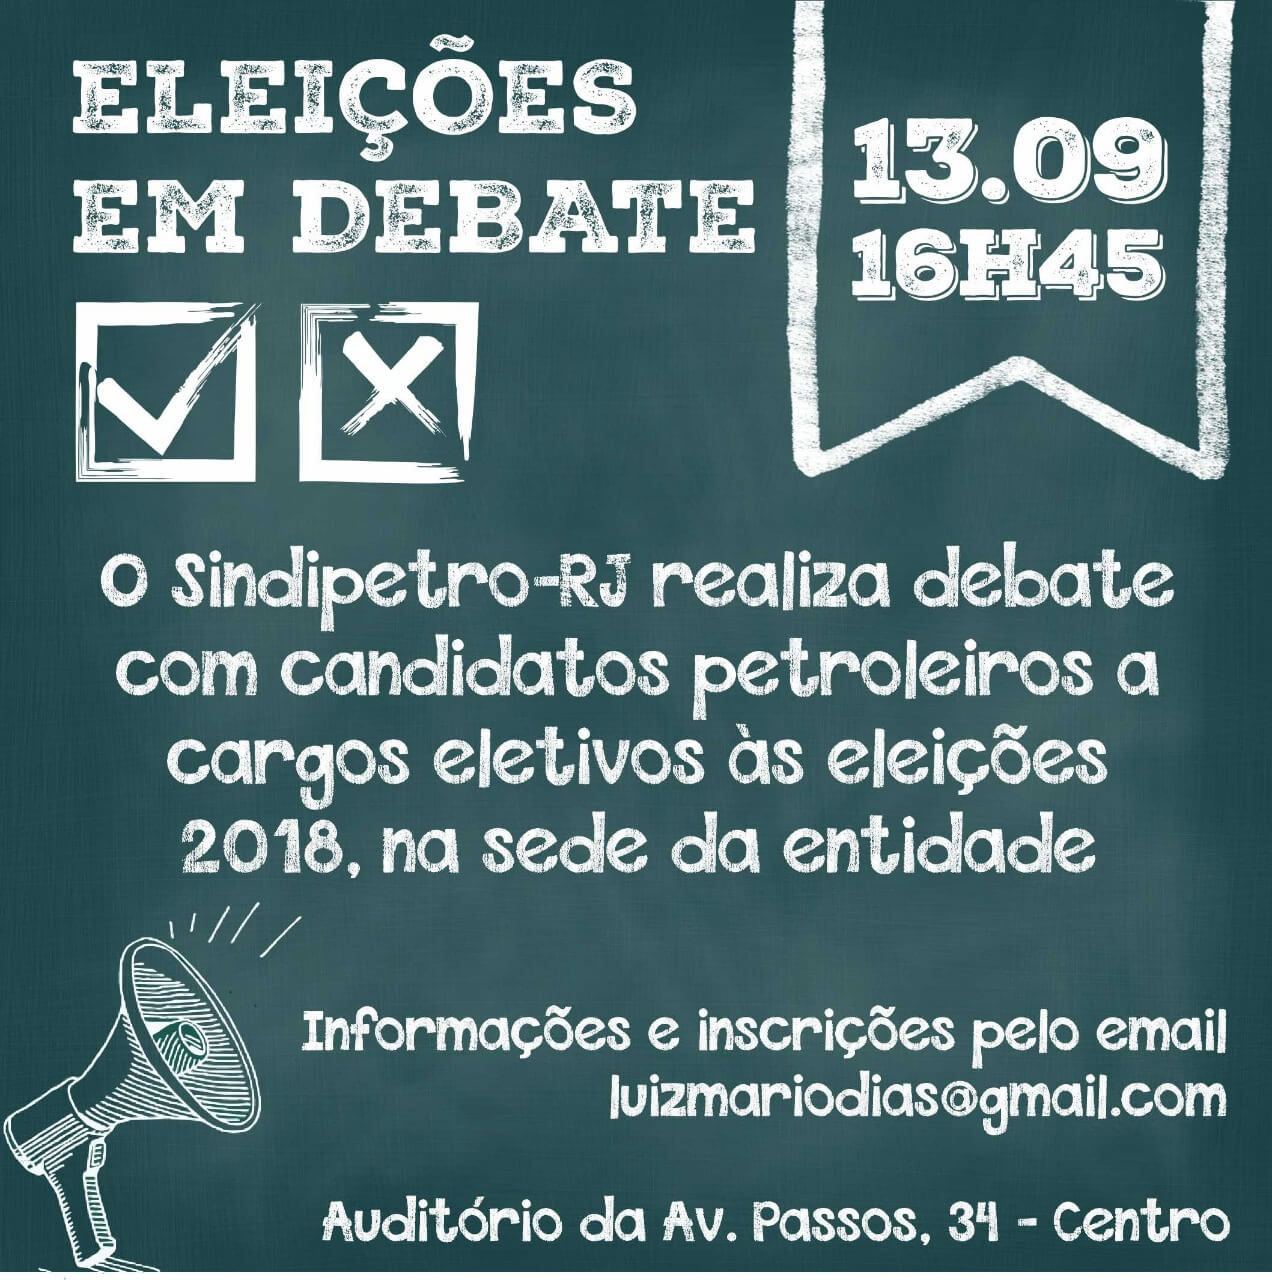 Eleições em debate WhatsApp Image 2018 09 11 at 17